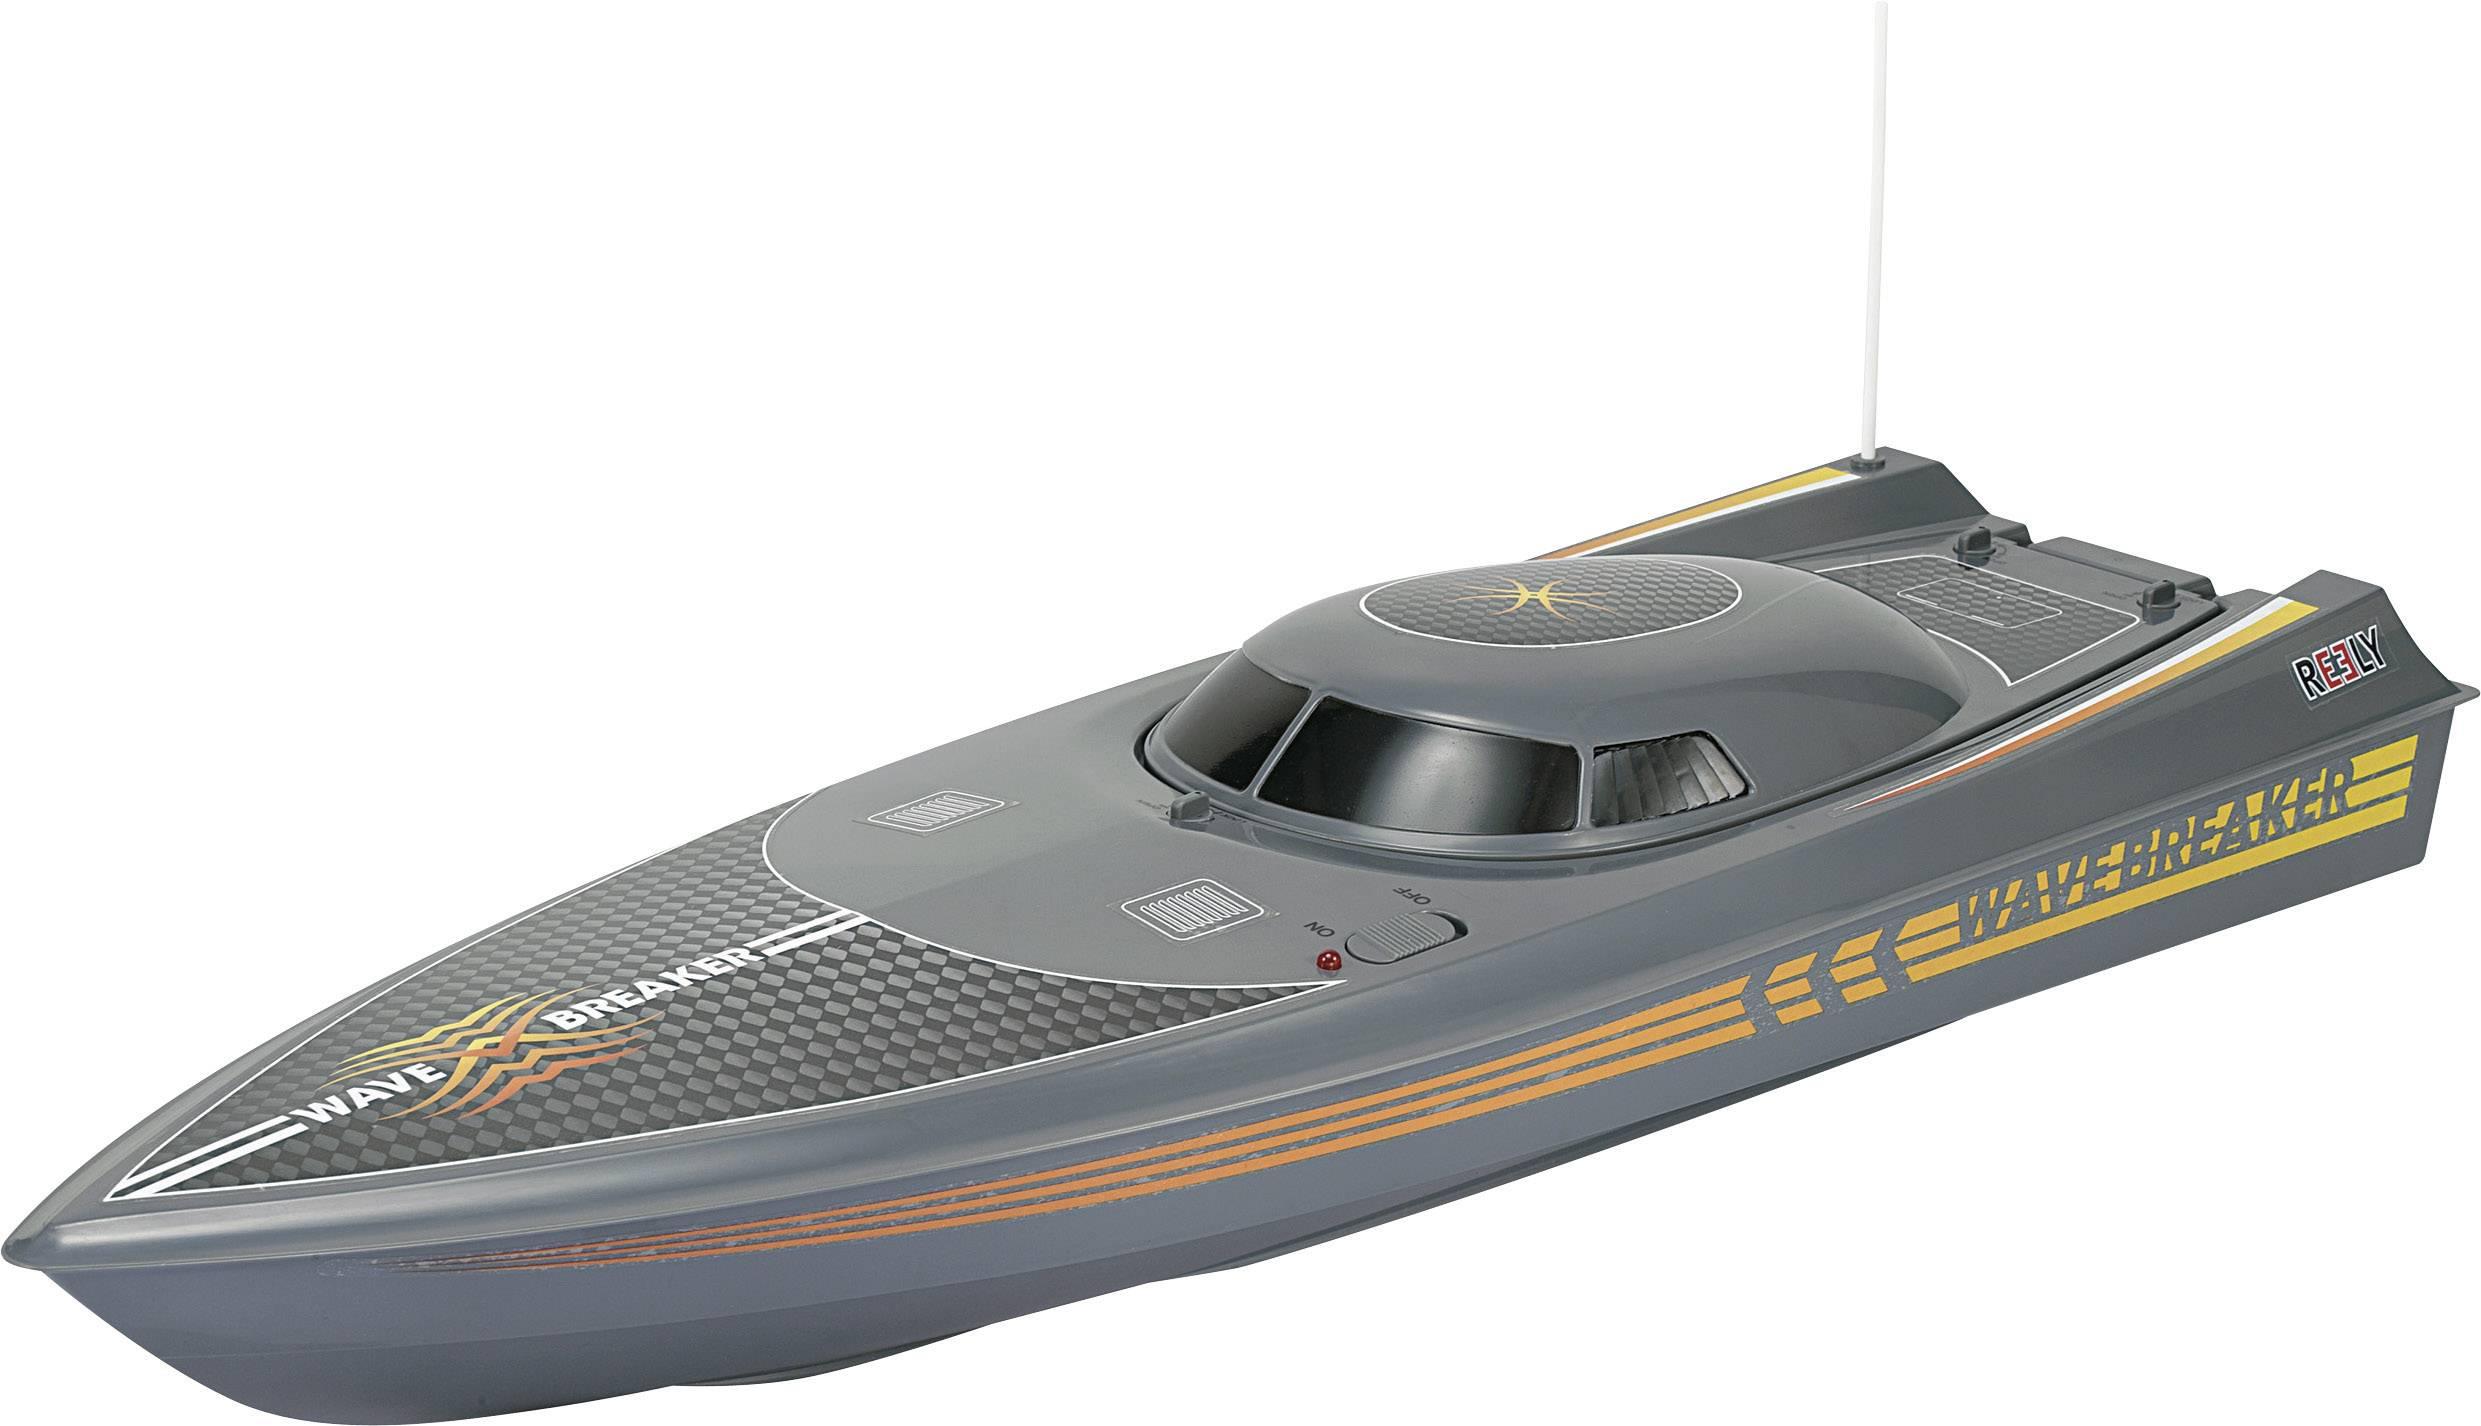 RC motorový čln Reely Wavebreaker, 100% RTR, 610 mm